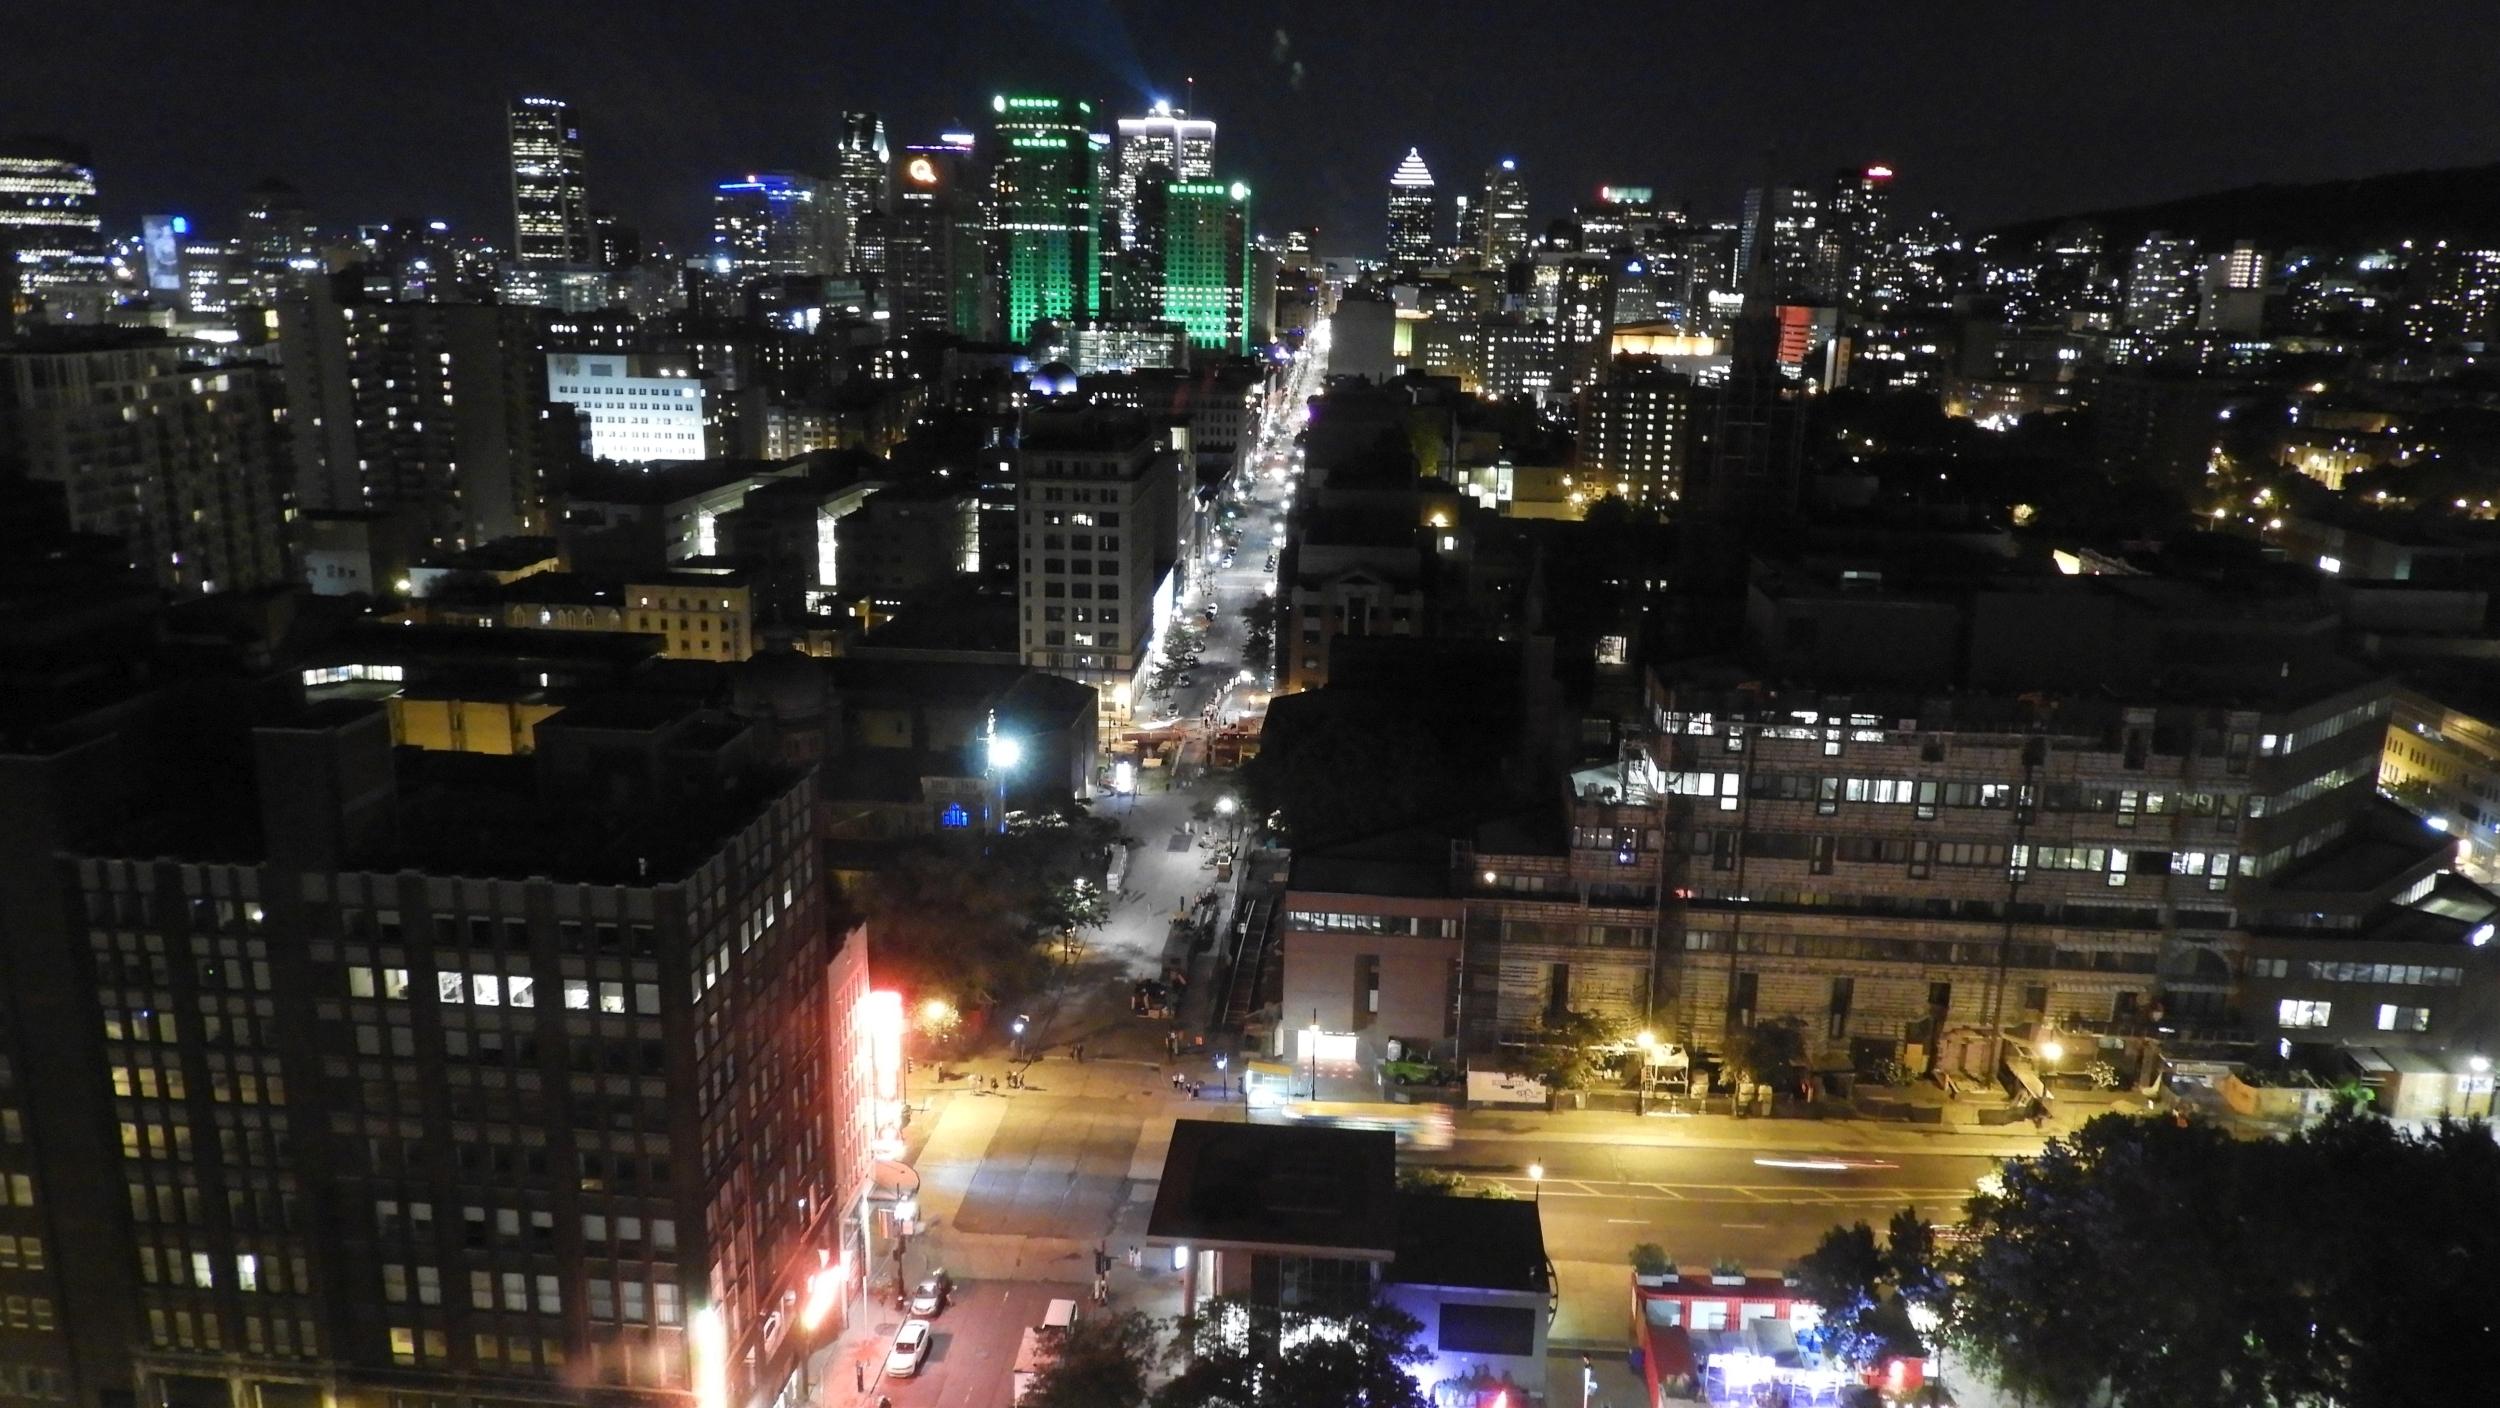 night, Montreal - architecture, lavilleauxcentclochers - koutayba | ello